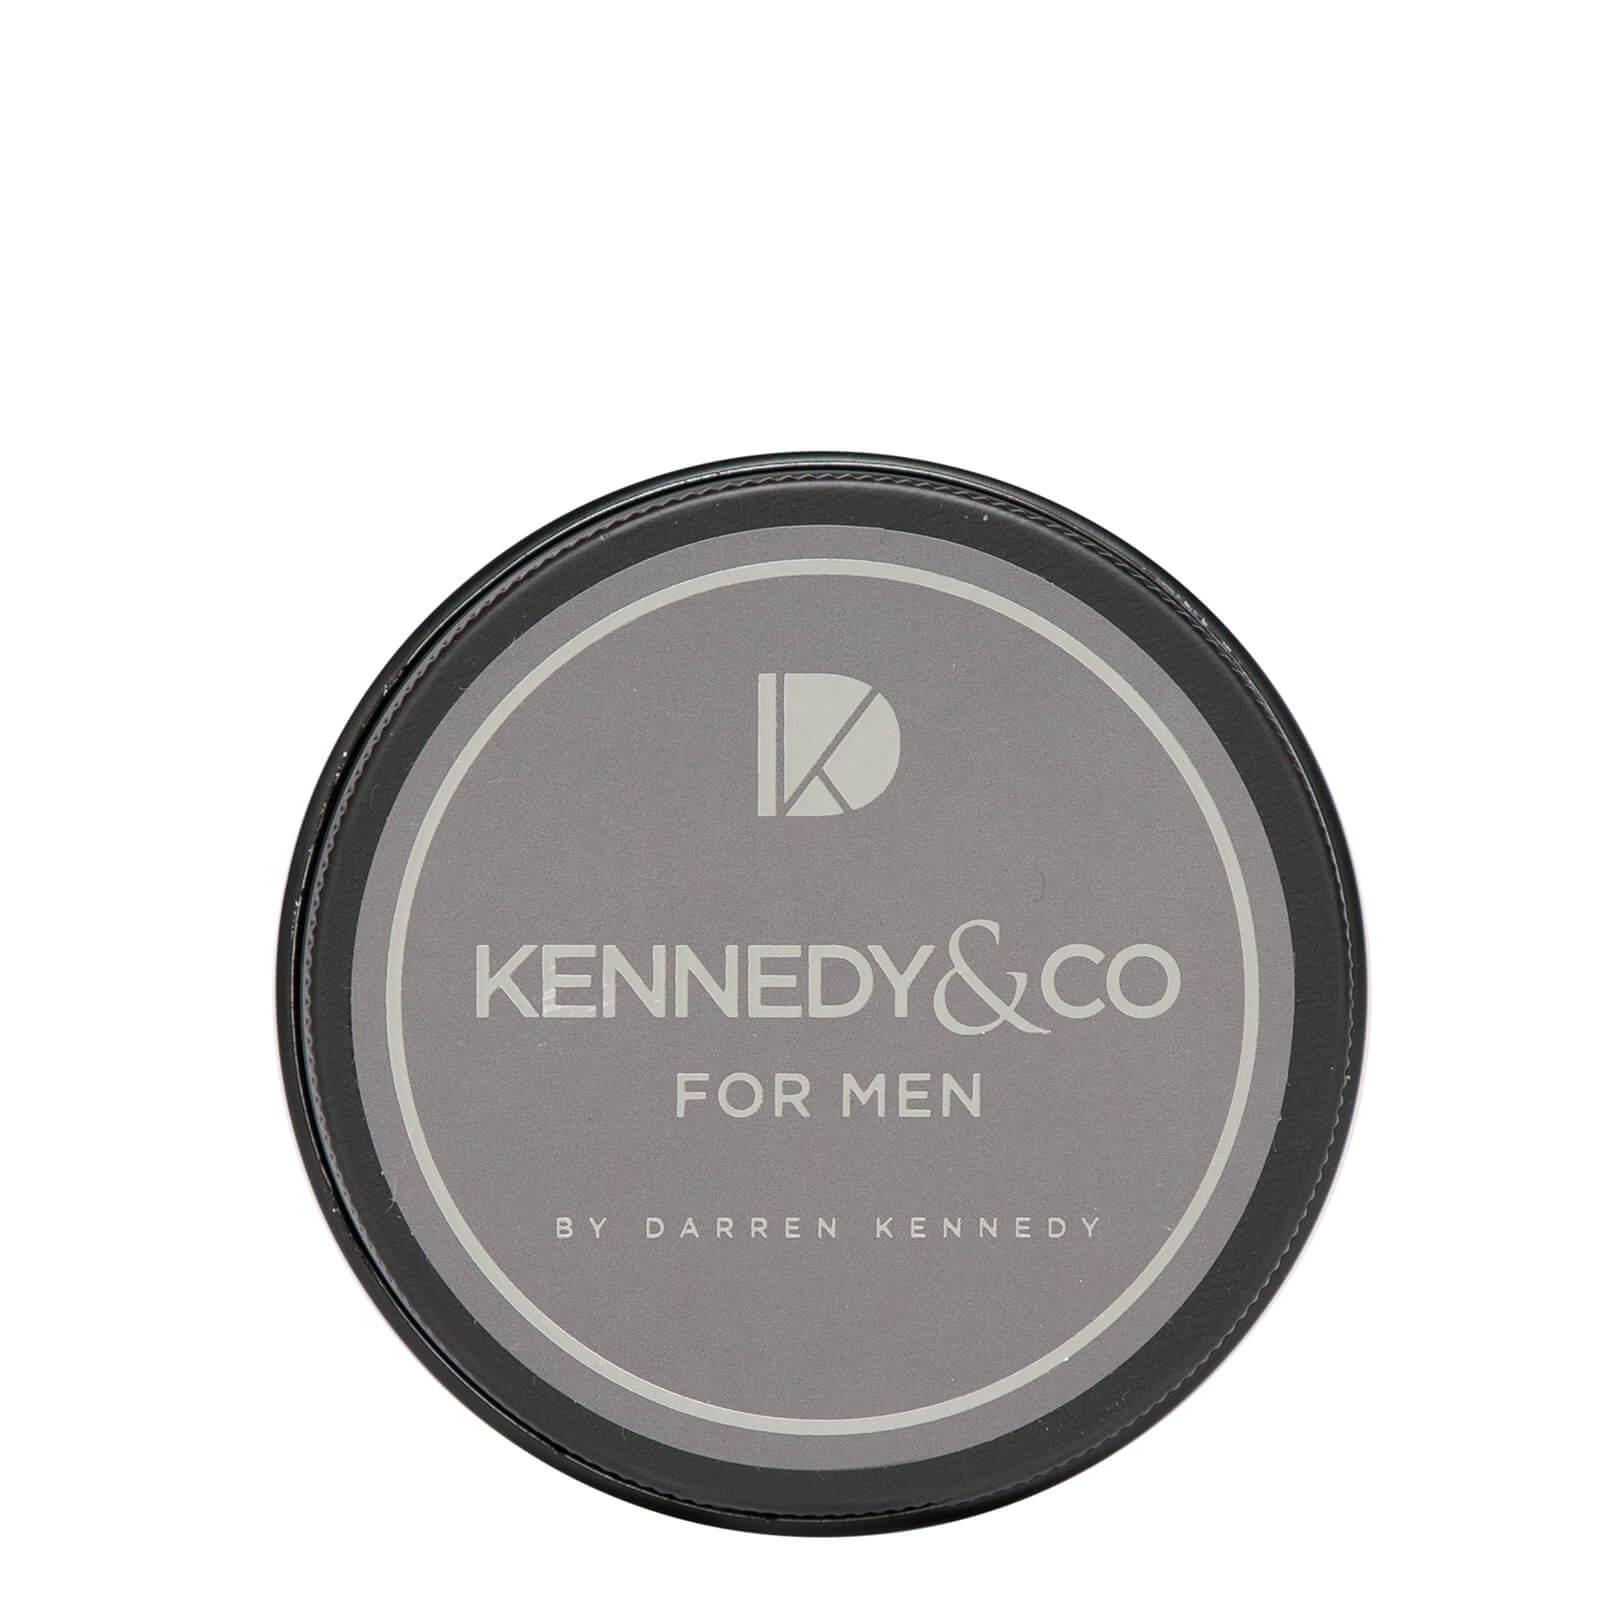 Купить Kennedy & Co Matte Hair Clay with Baicapil 75ml